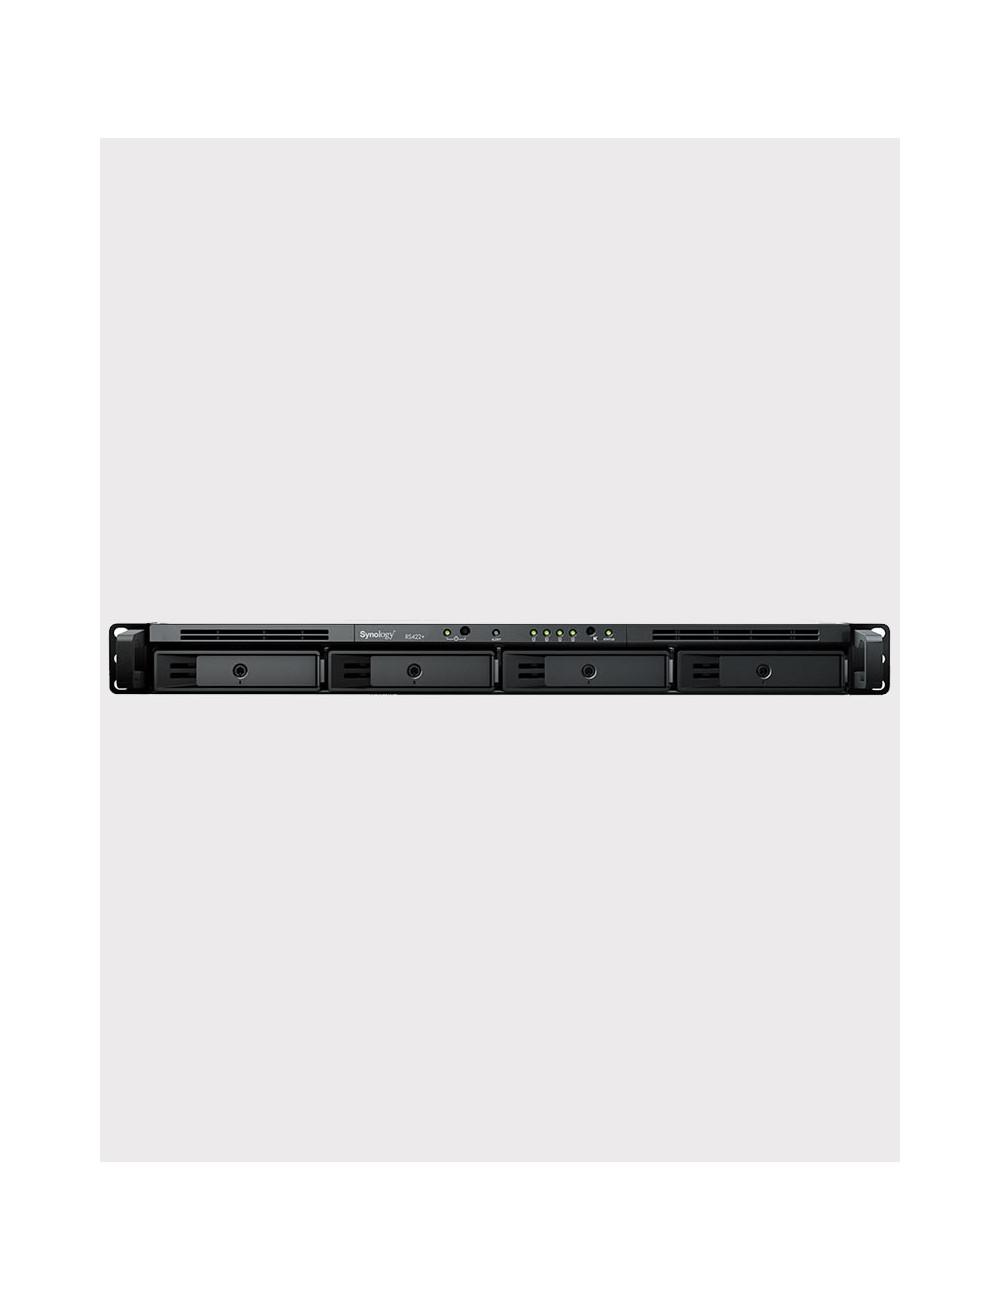 Pack 10 Mailbox Zimbra Basic + Domain .COM - 1 year